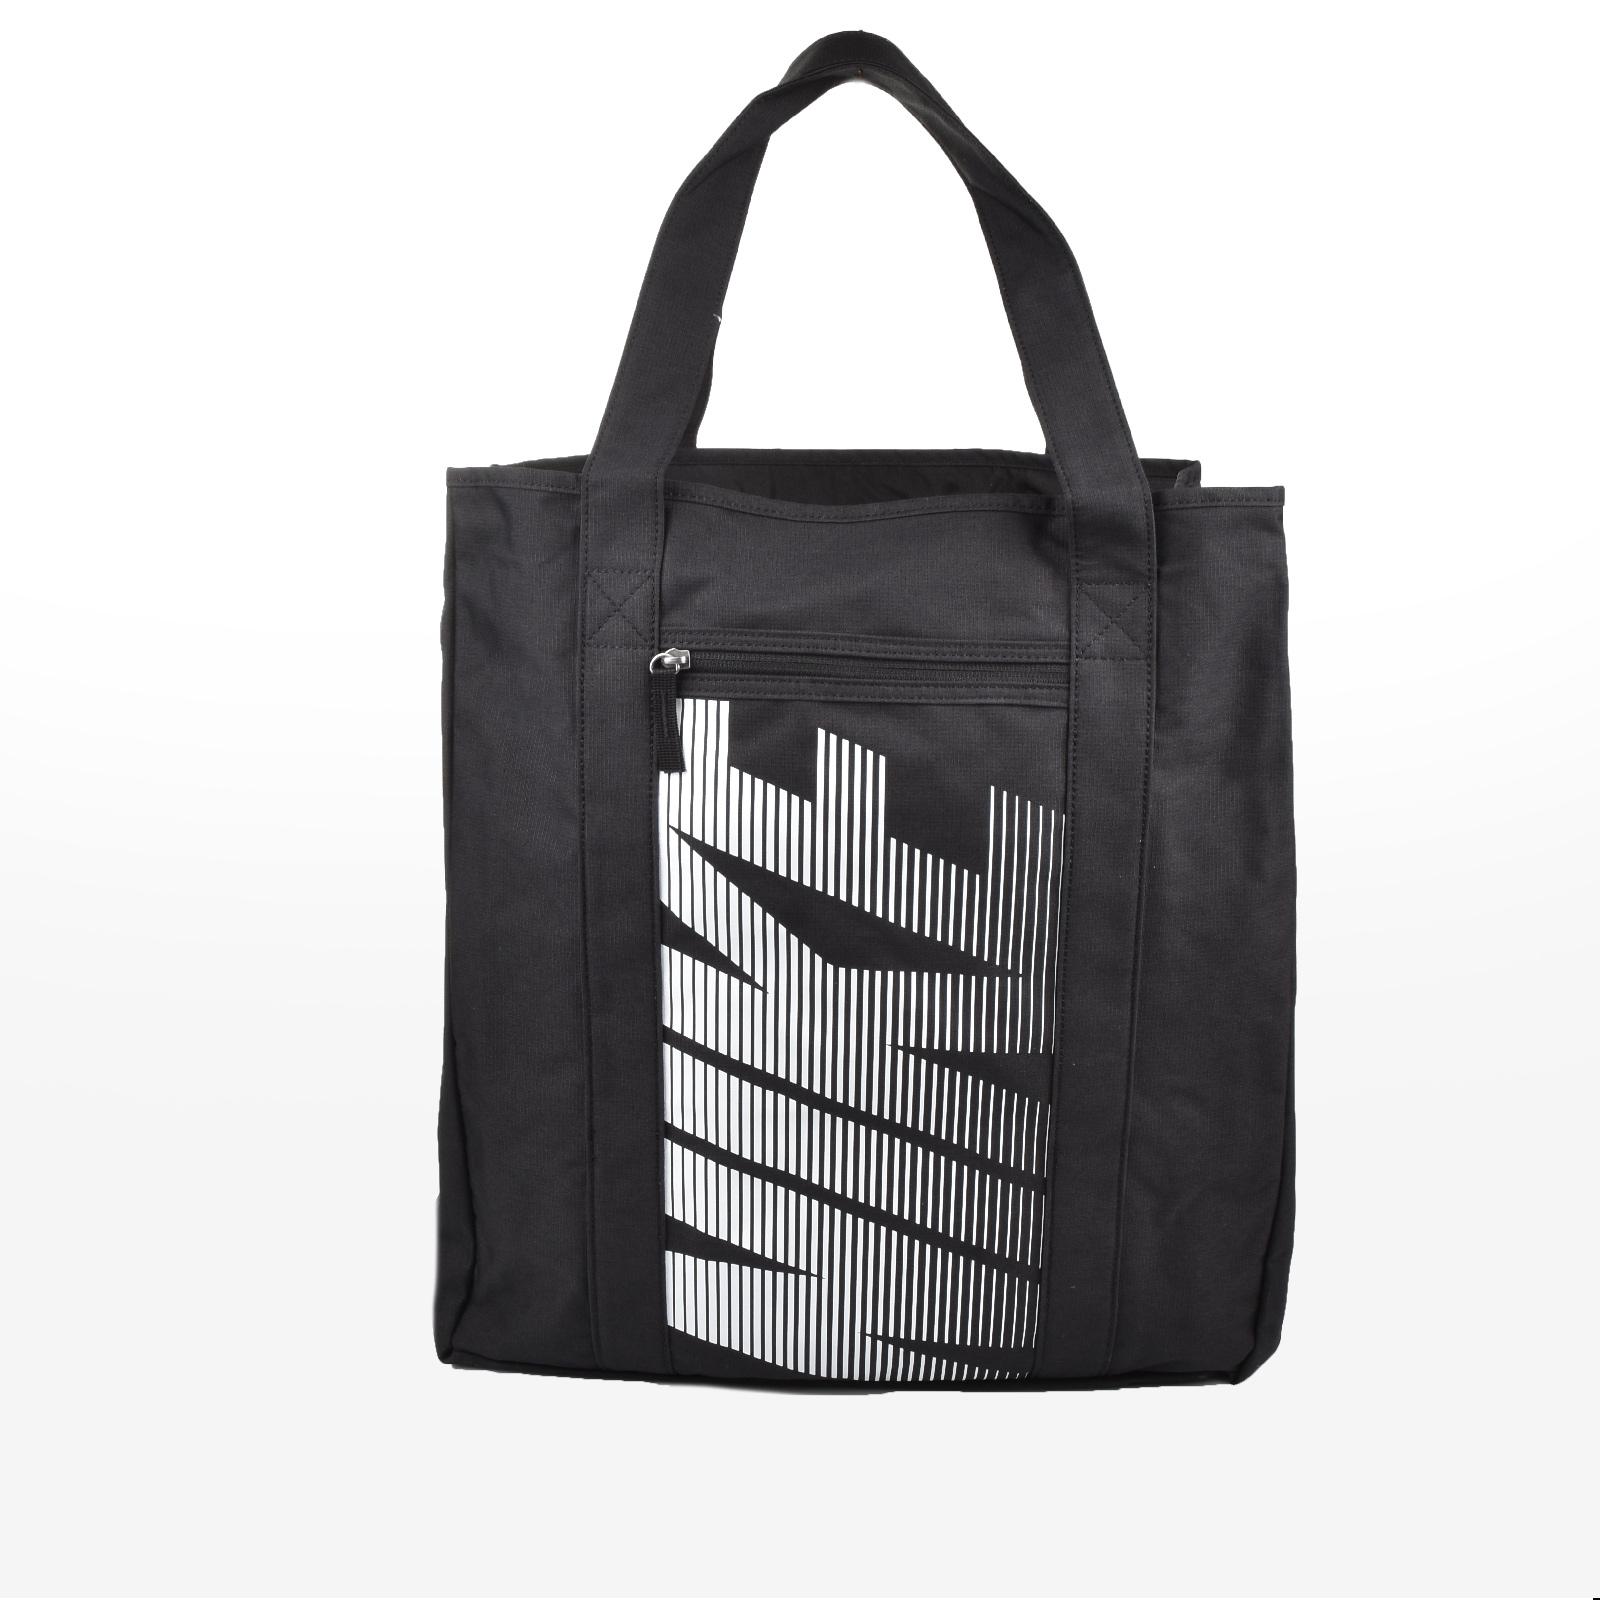 Nike - W NK GYM TOTE - BLACK/BLACK/WHITE